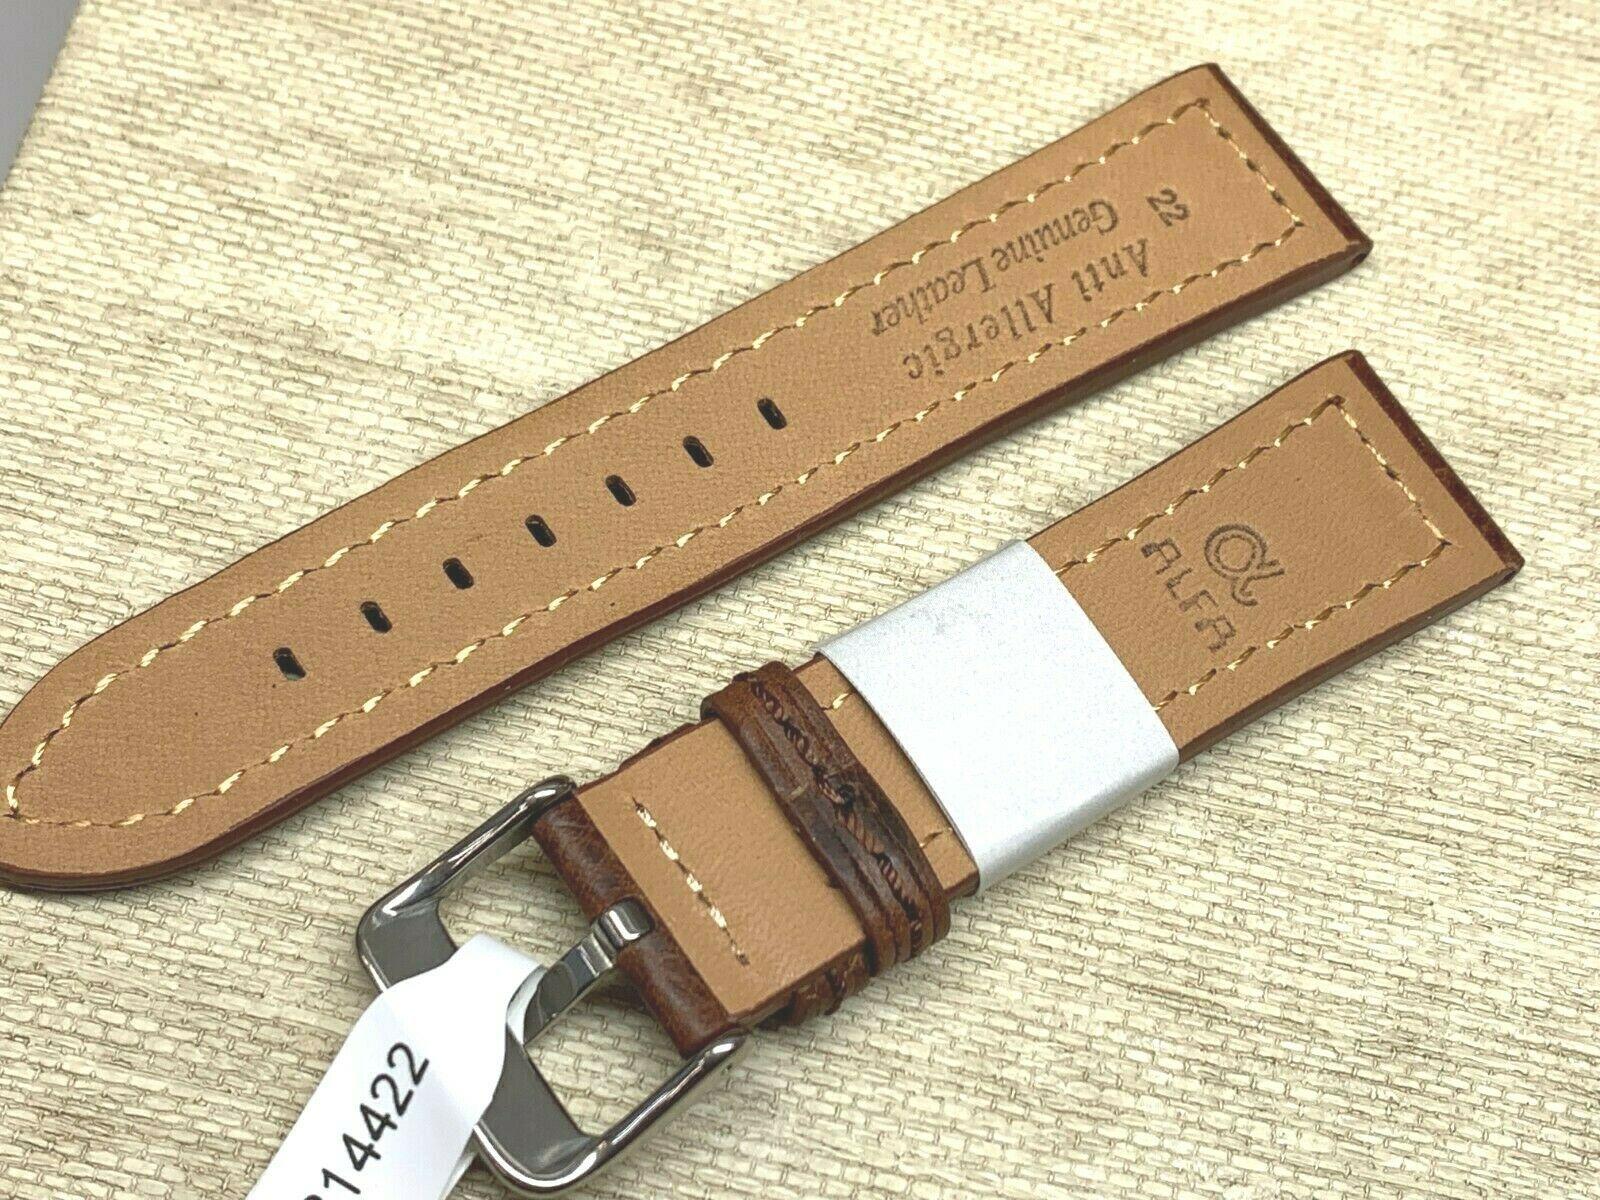 Alfa euro genuine leather watch band 22mm Premium calf  fits hamilton too image 2